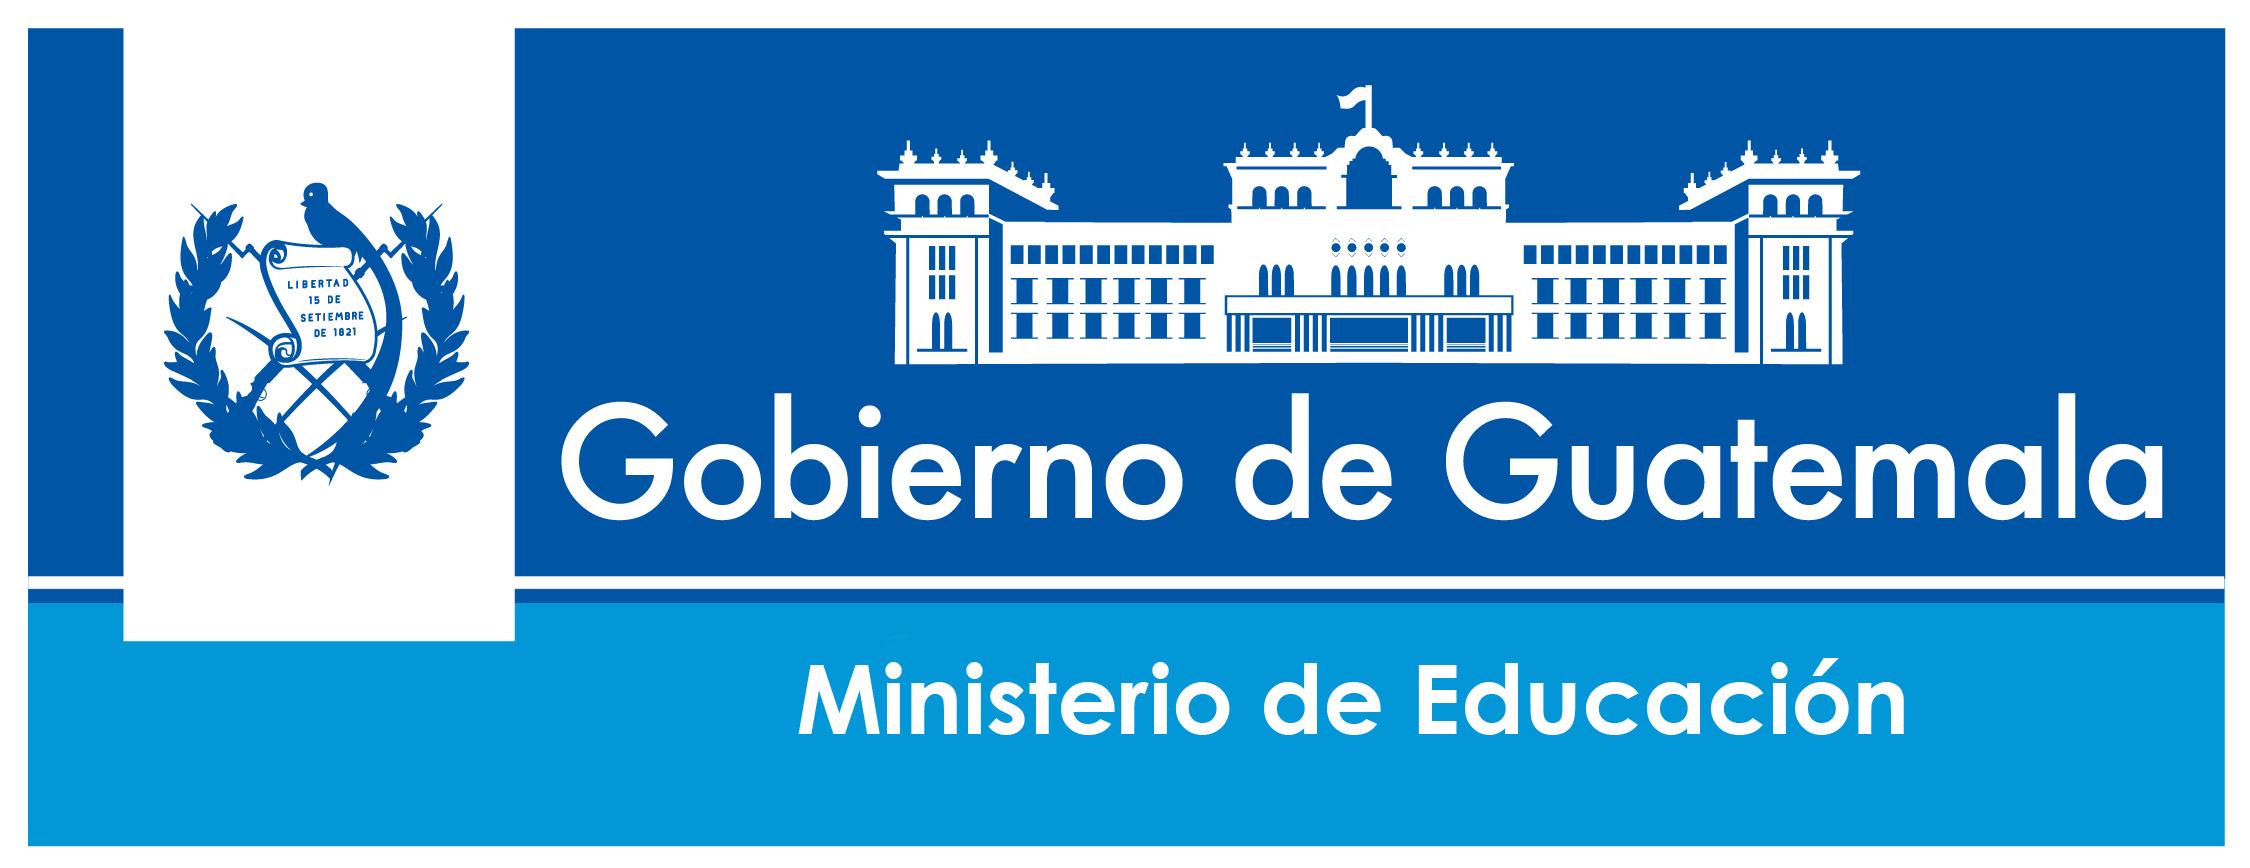 Sistema de consulta de carreras autorizadas pensotec for Ministerio de educacion plazas